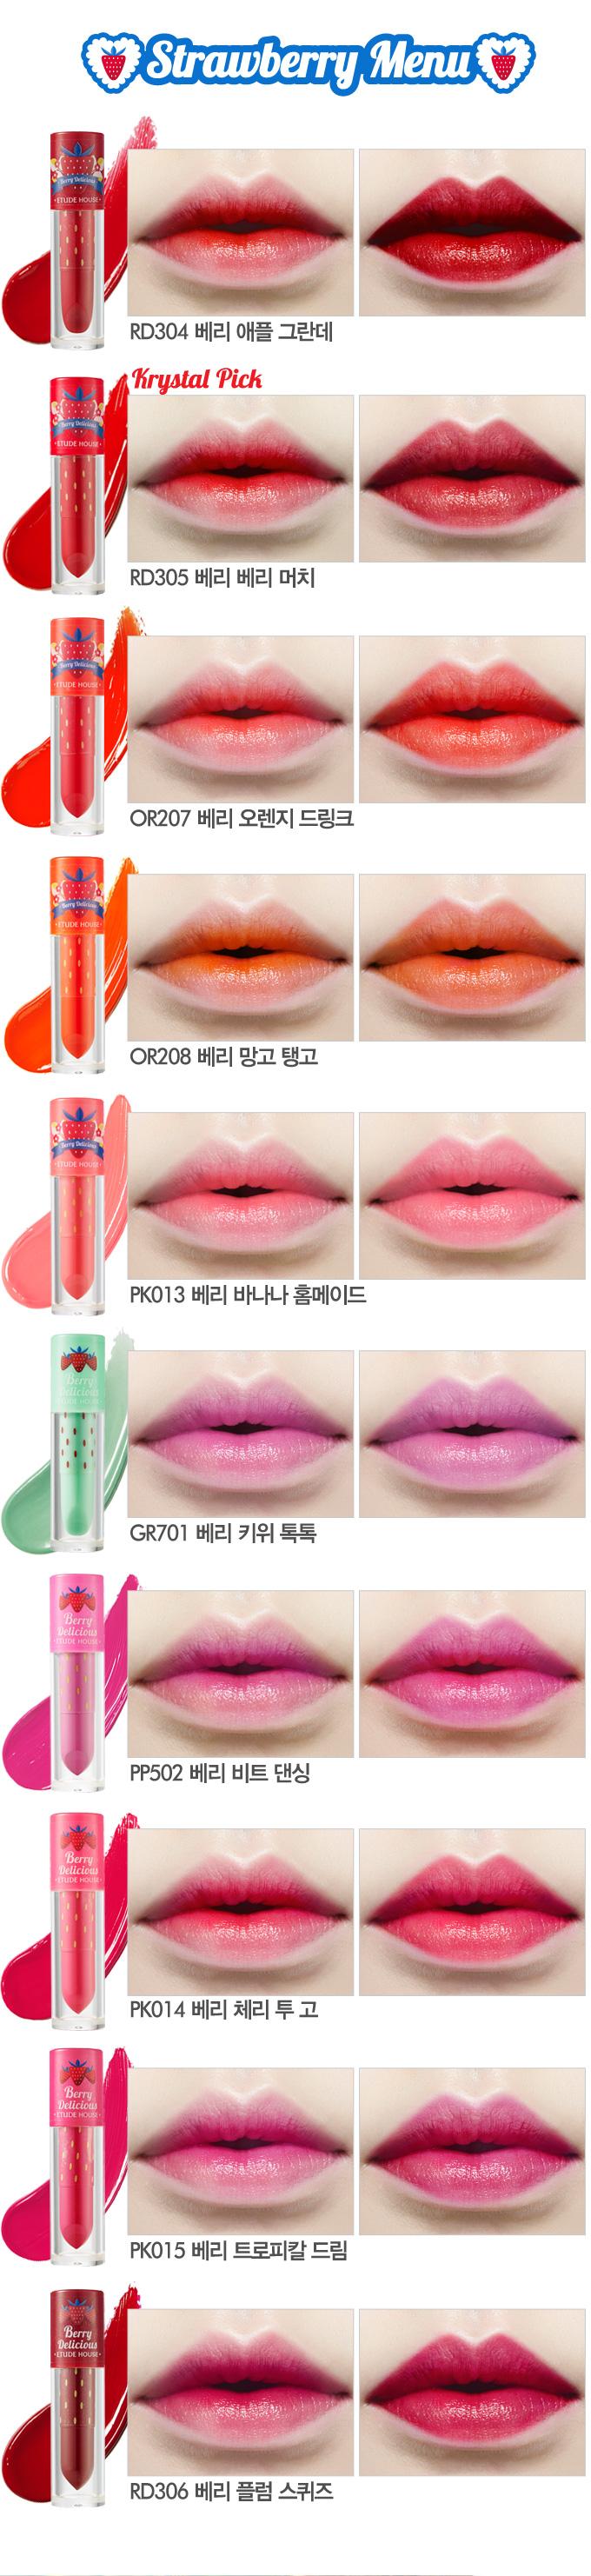 Berry Delicious Color In Liquid Lips2